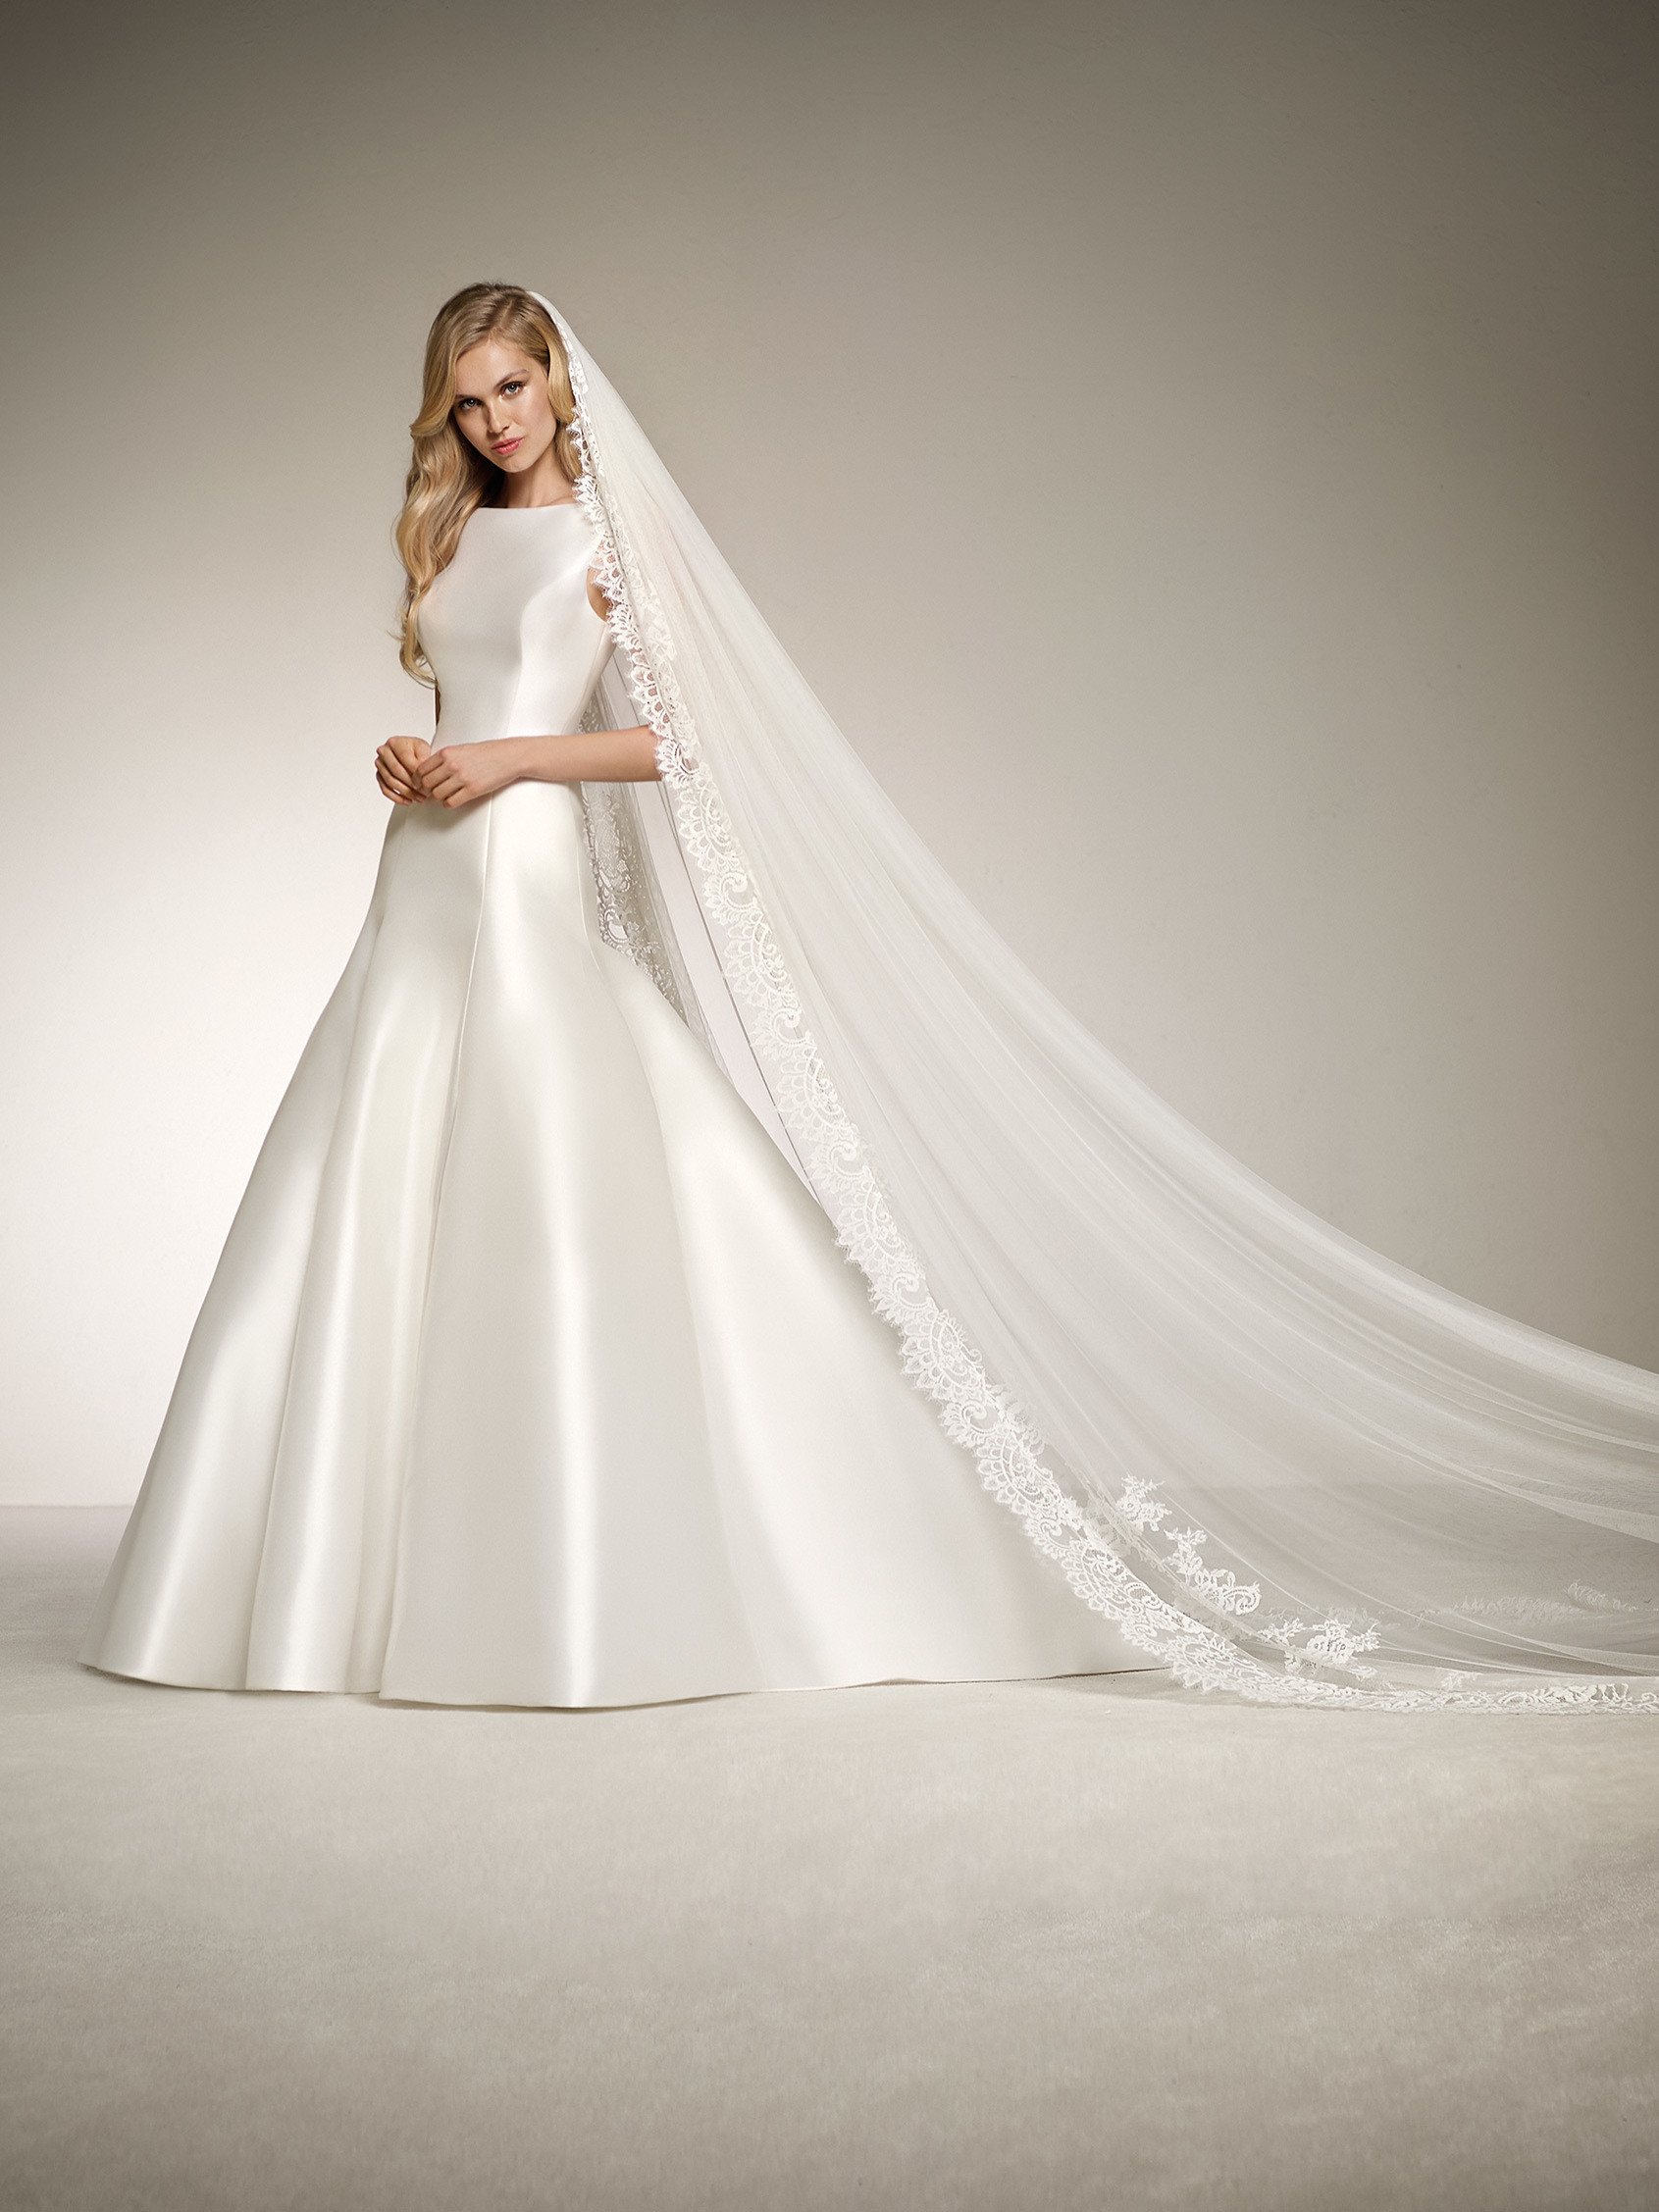 wedding dress of 2018